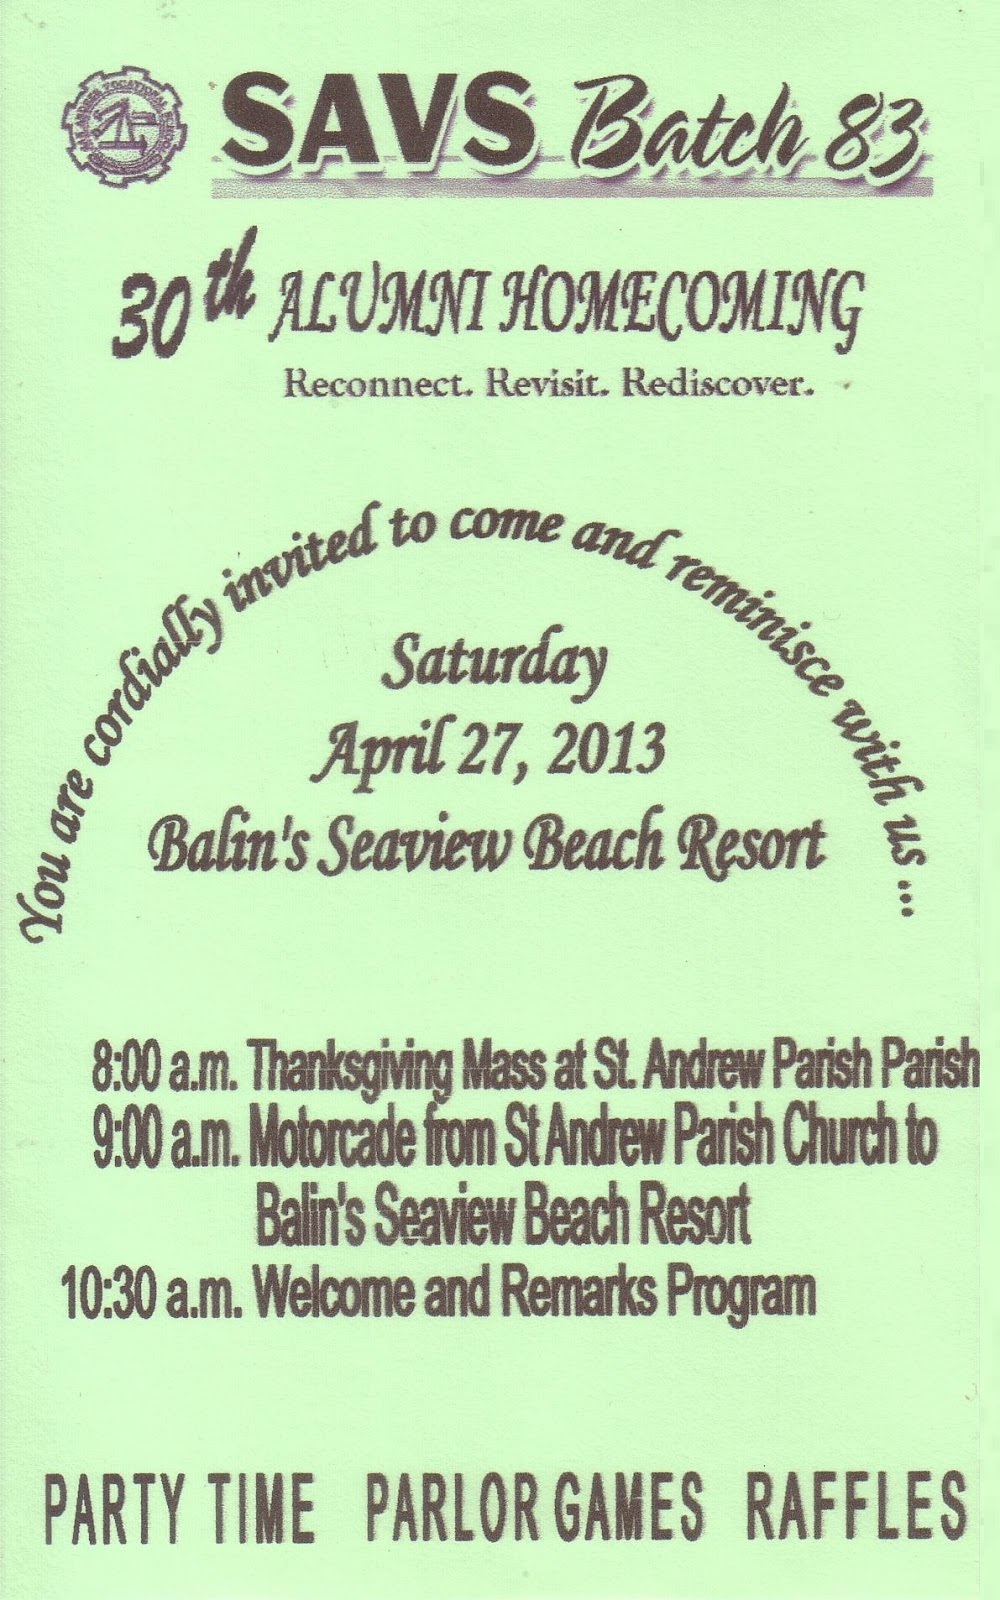 SAVS Batch 83 Our Alumni Homecoming Invitation